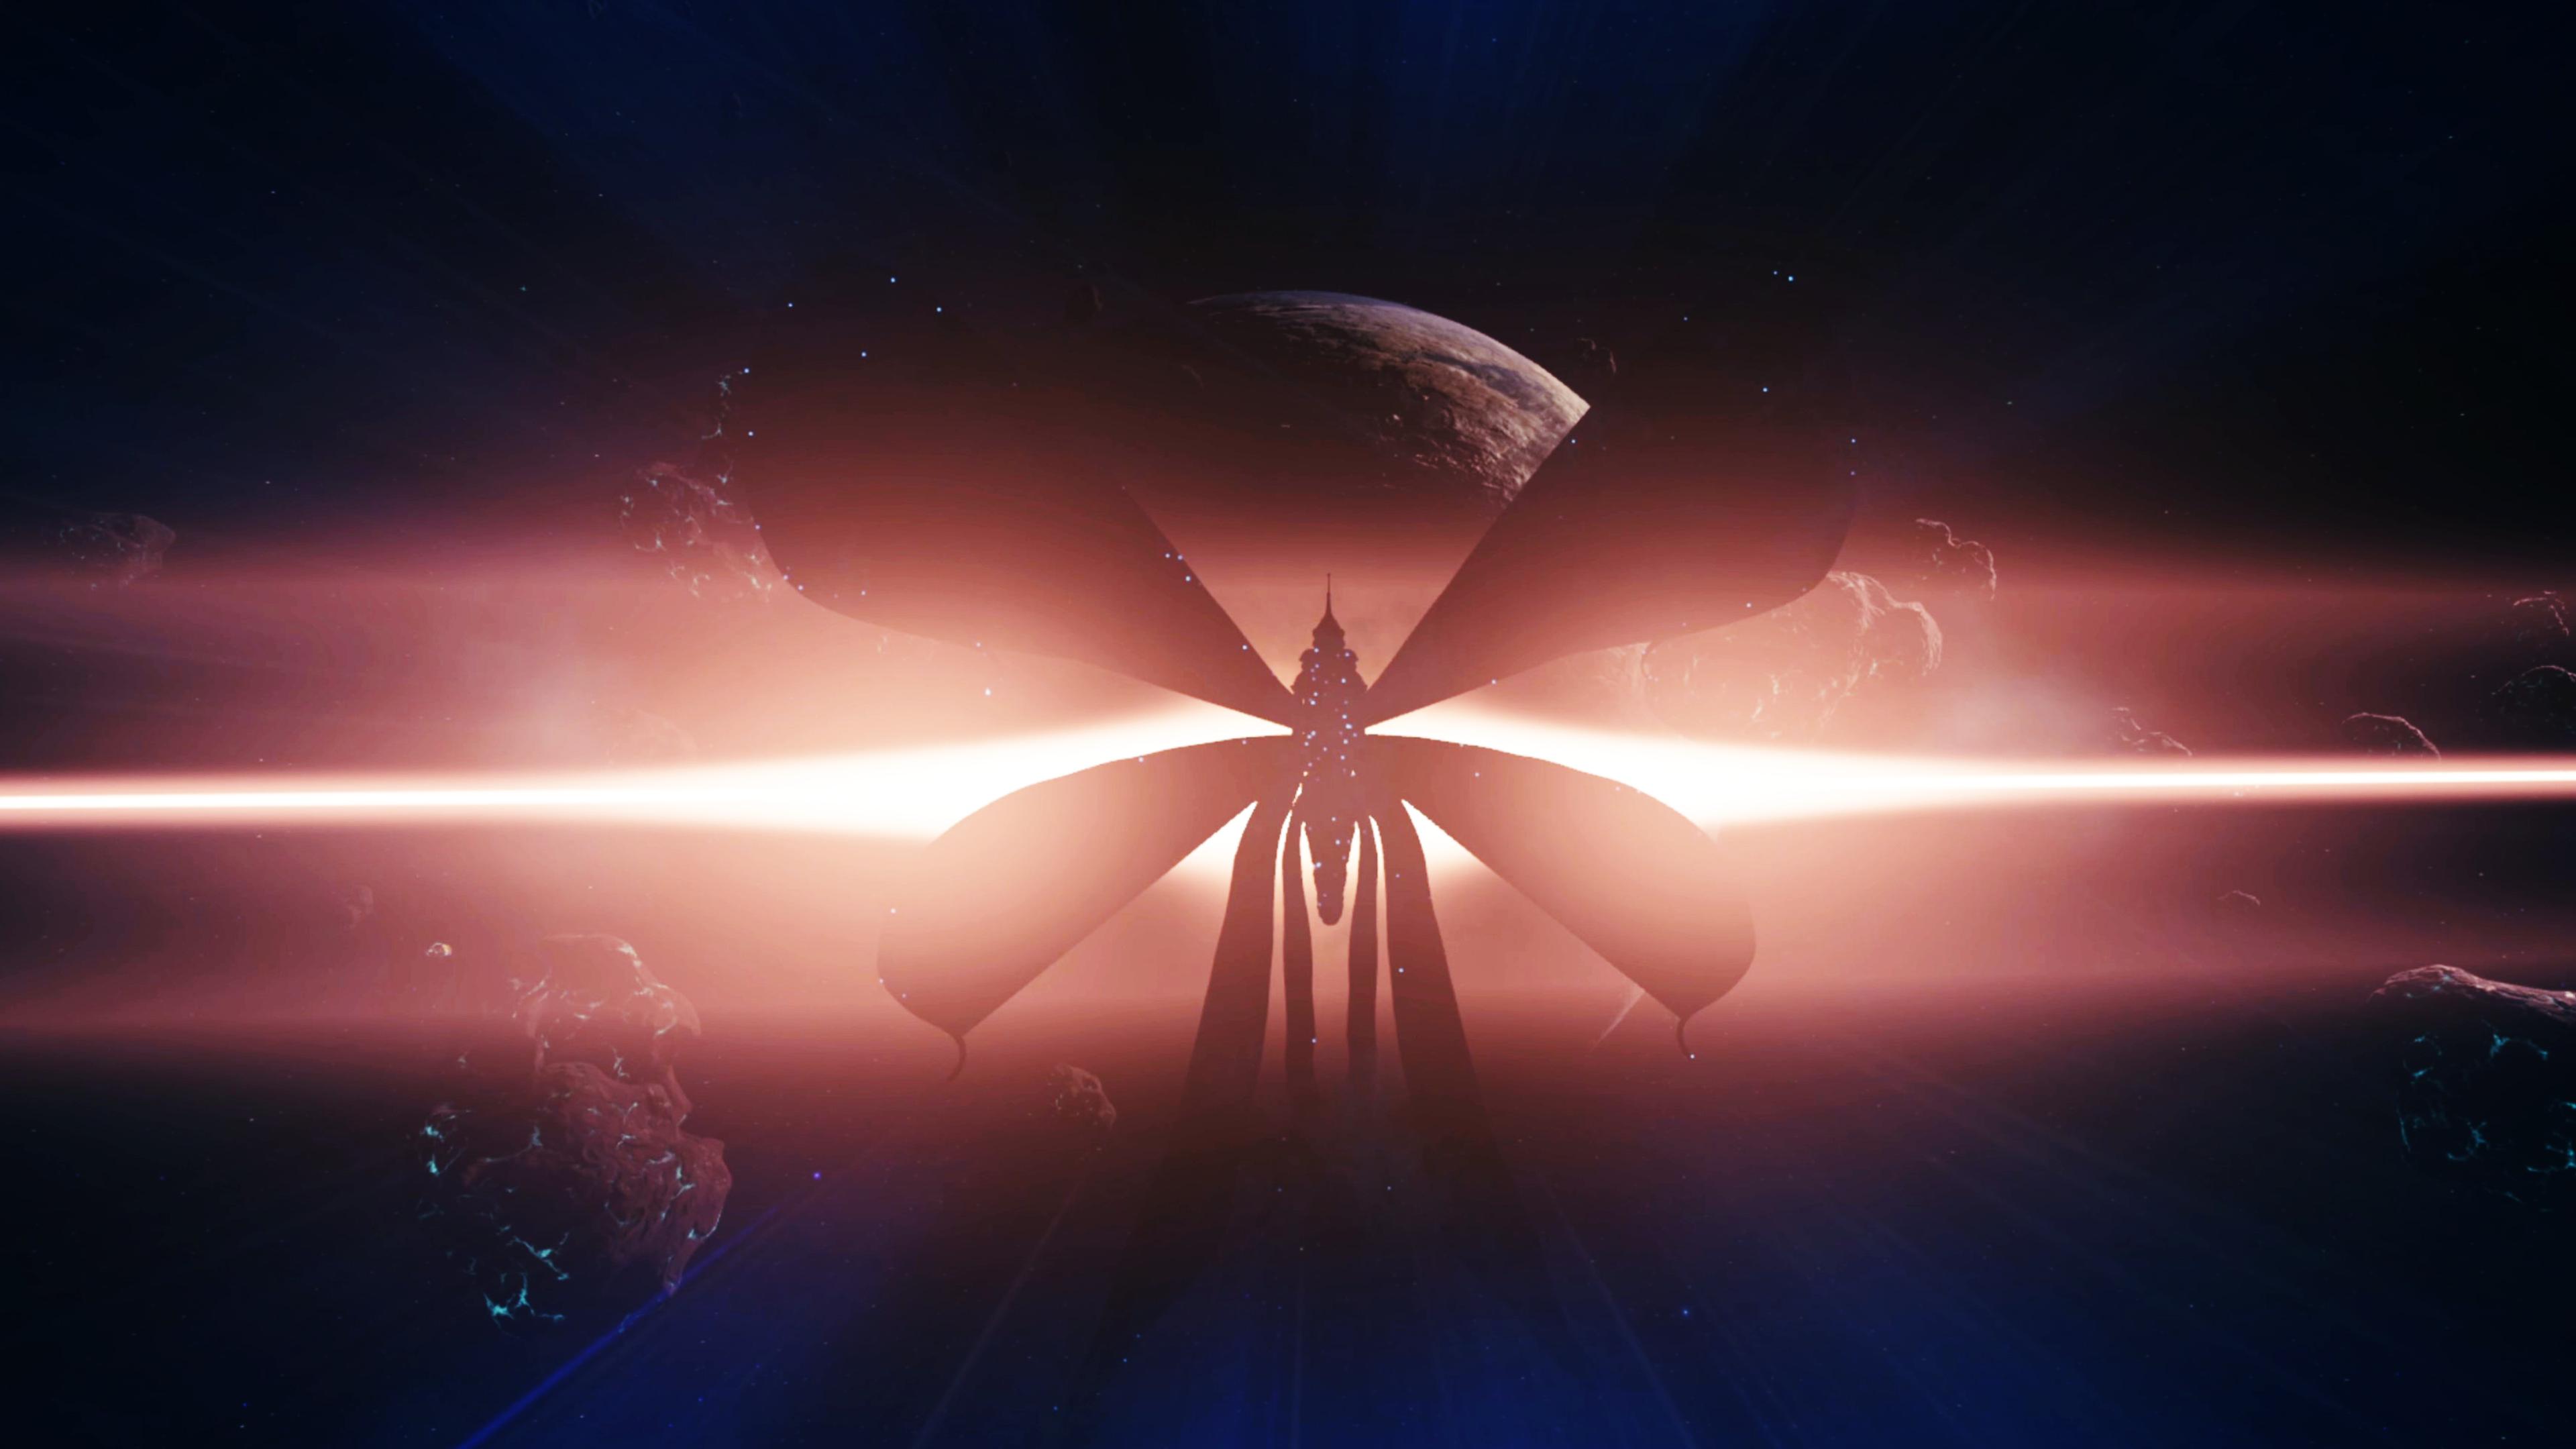 IONIA_space_harpa_v1